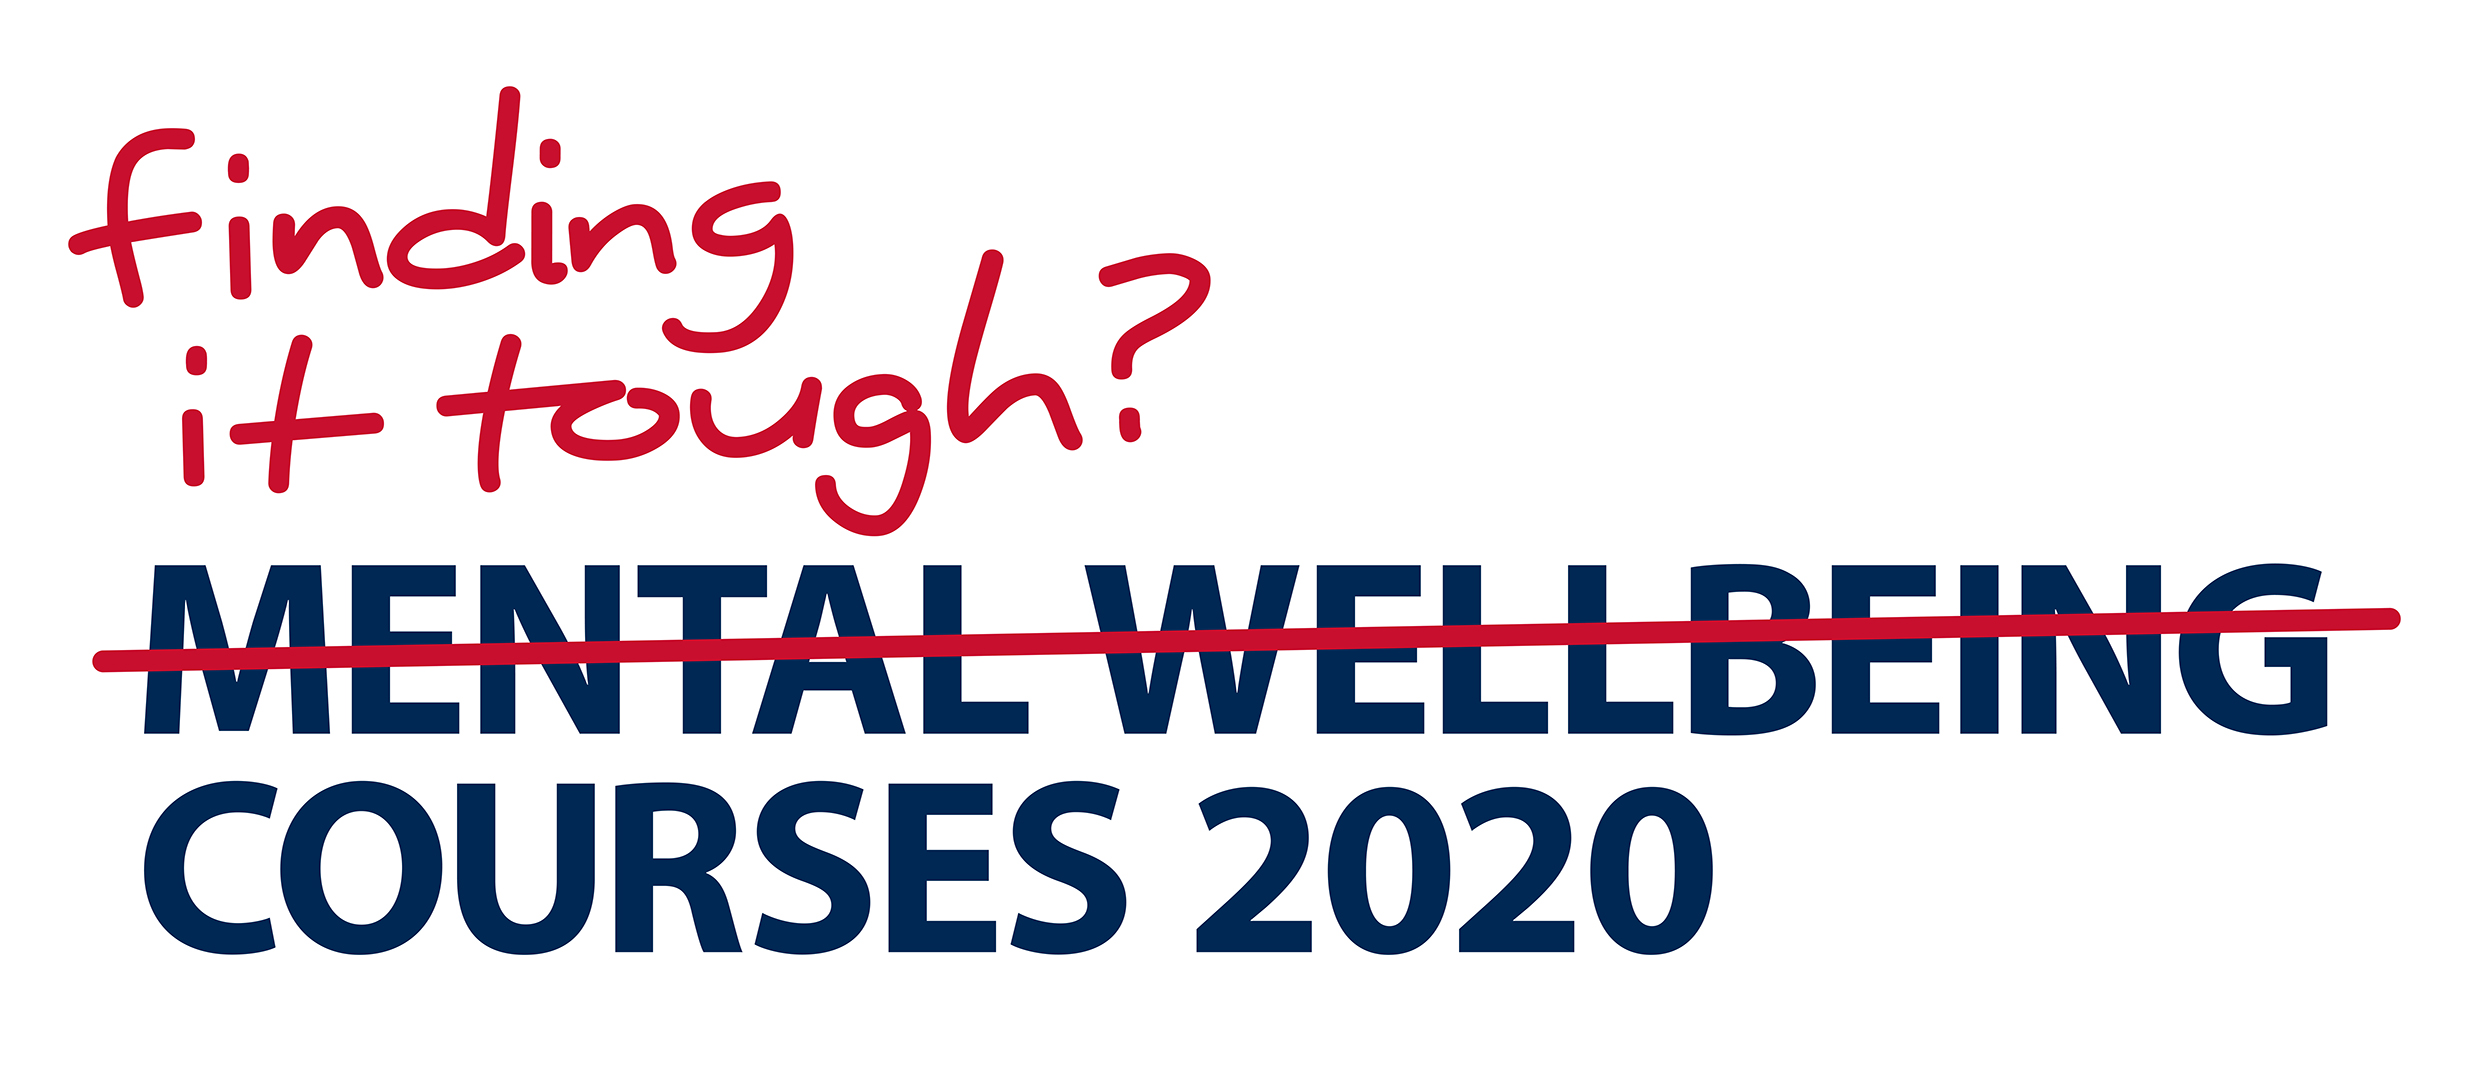 Finding it tough? Courses 2020